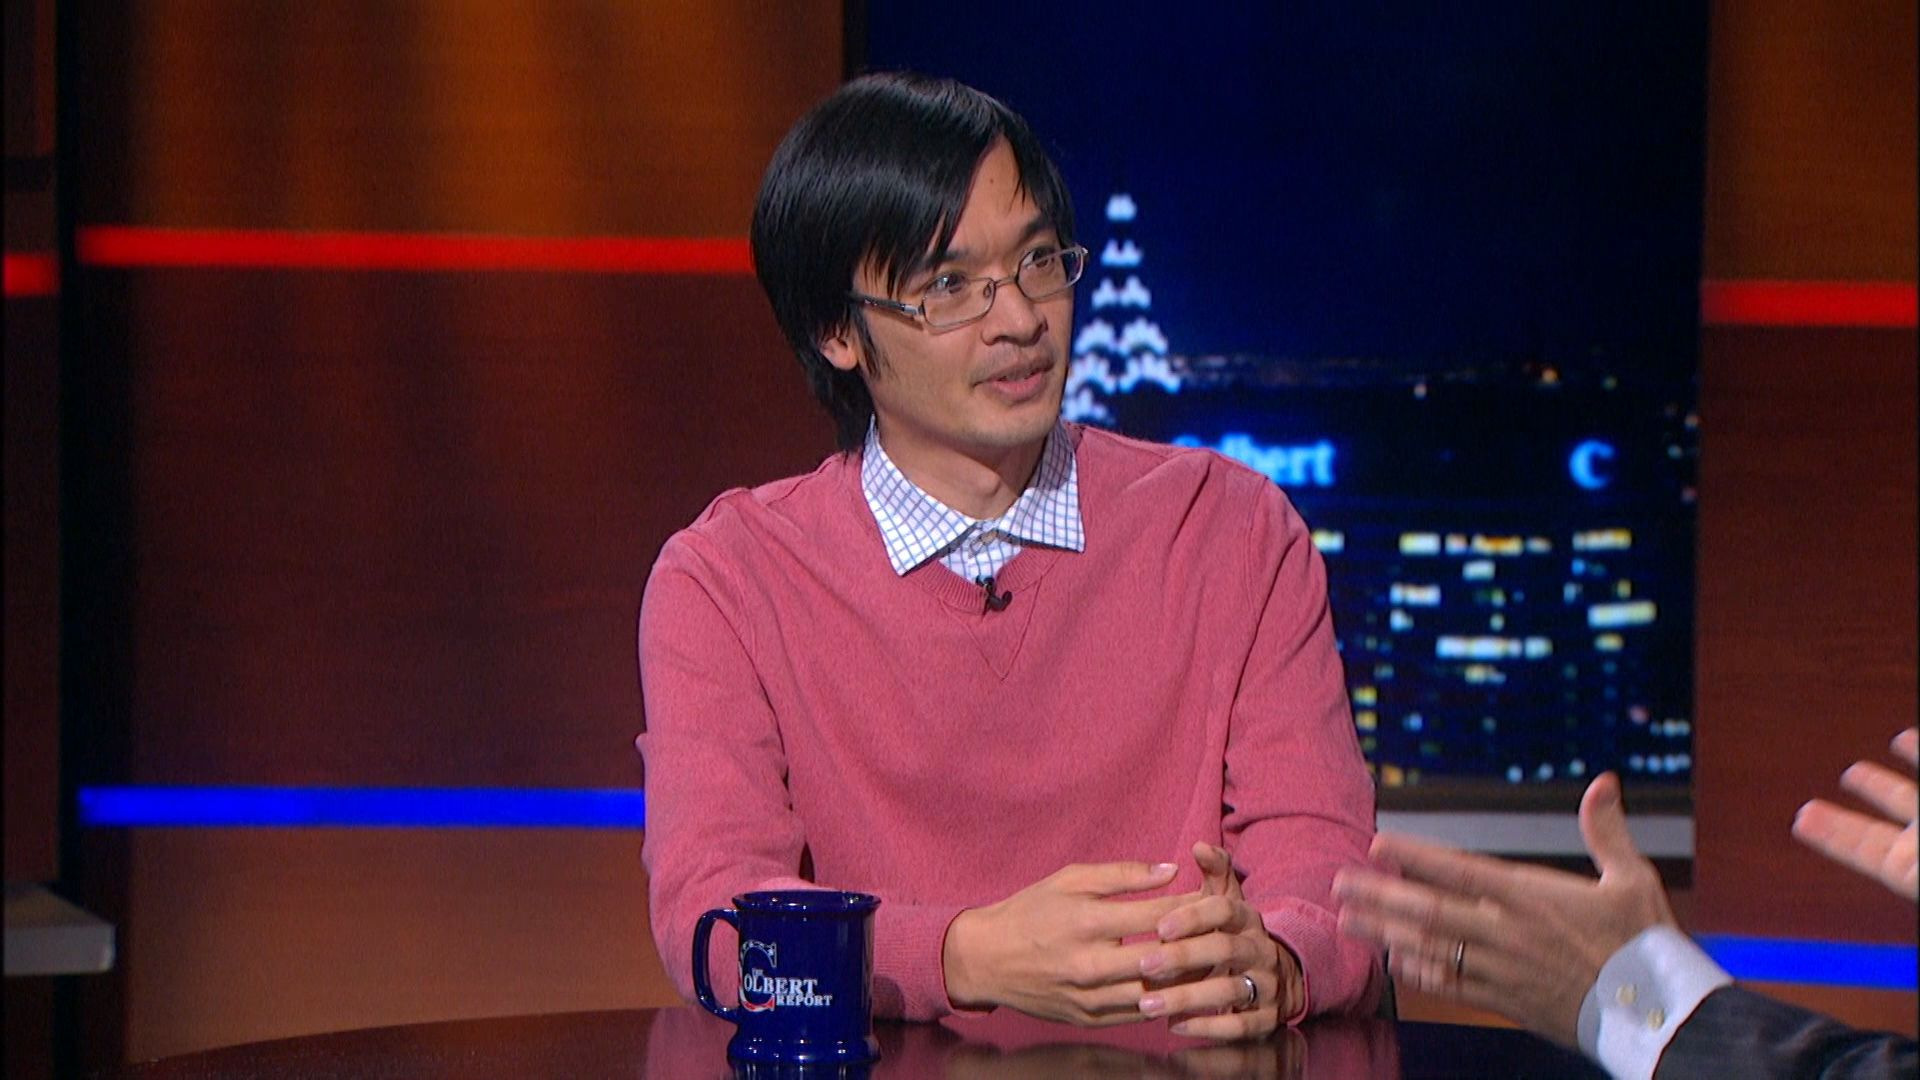 Terence Tao Terence Tao The Colbert Report Video